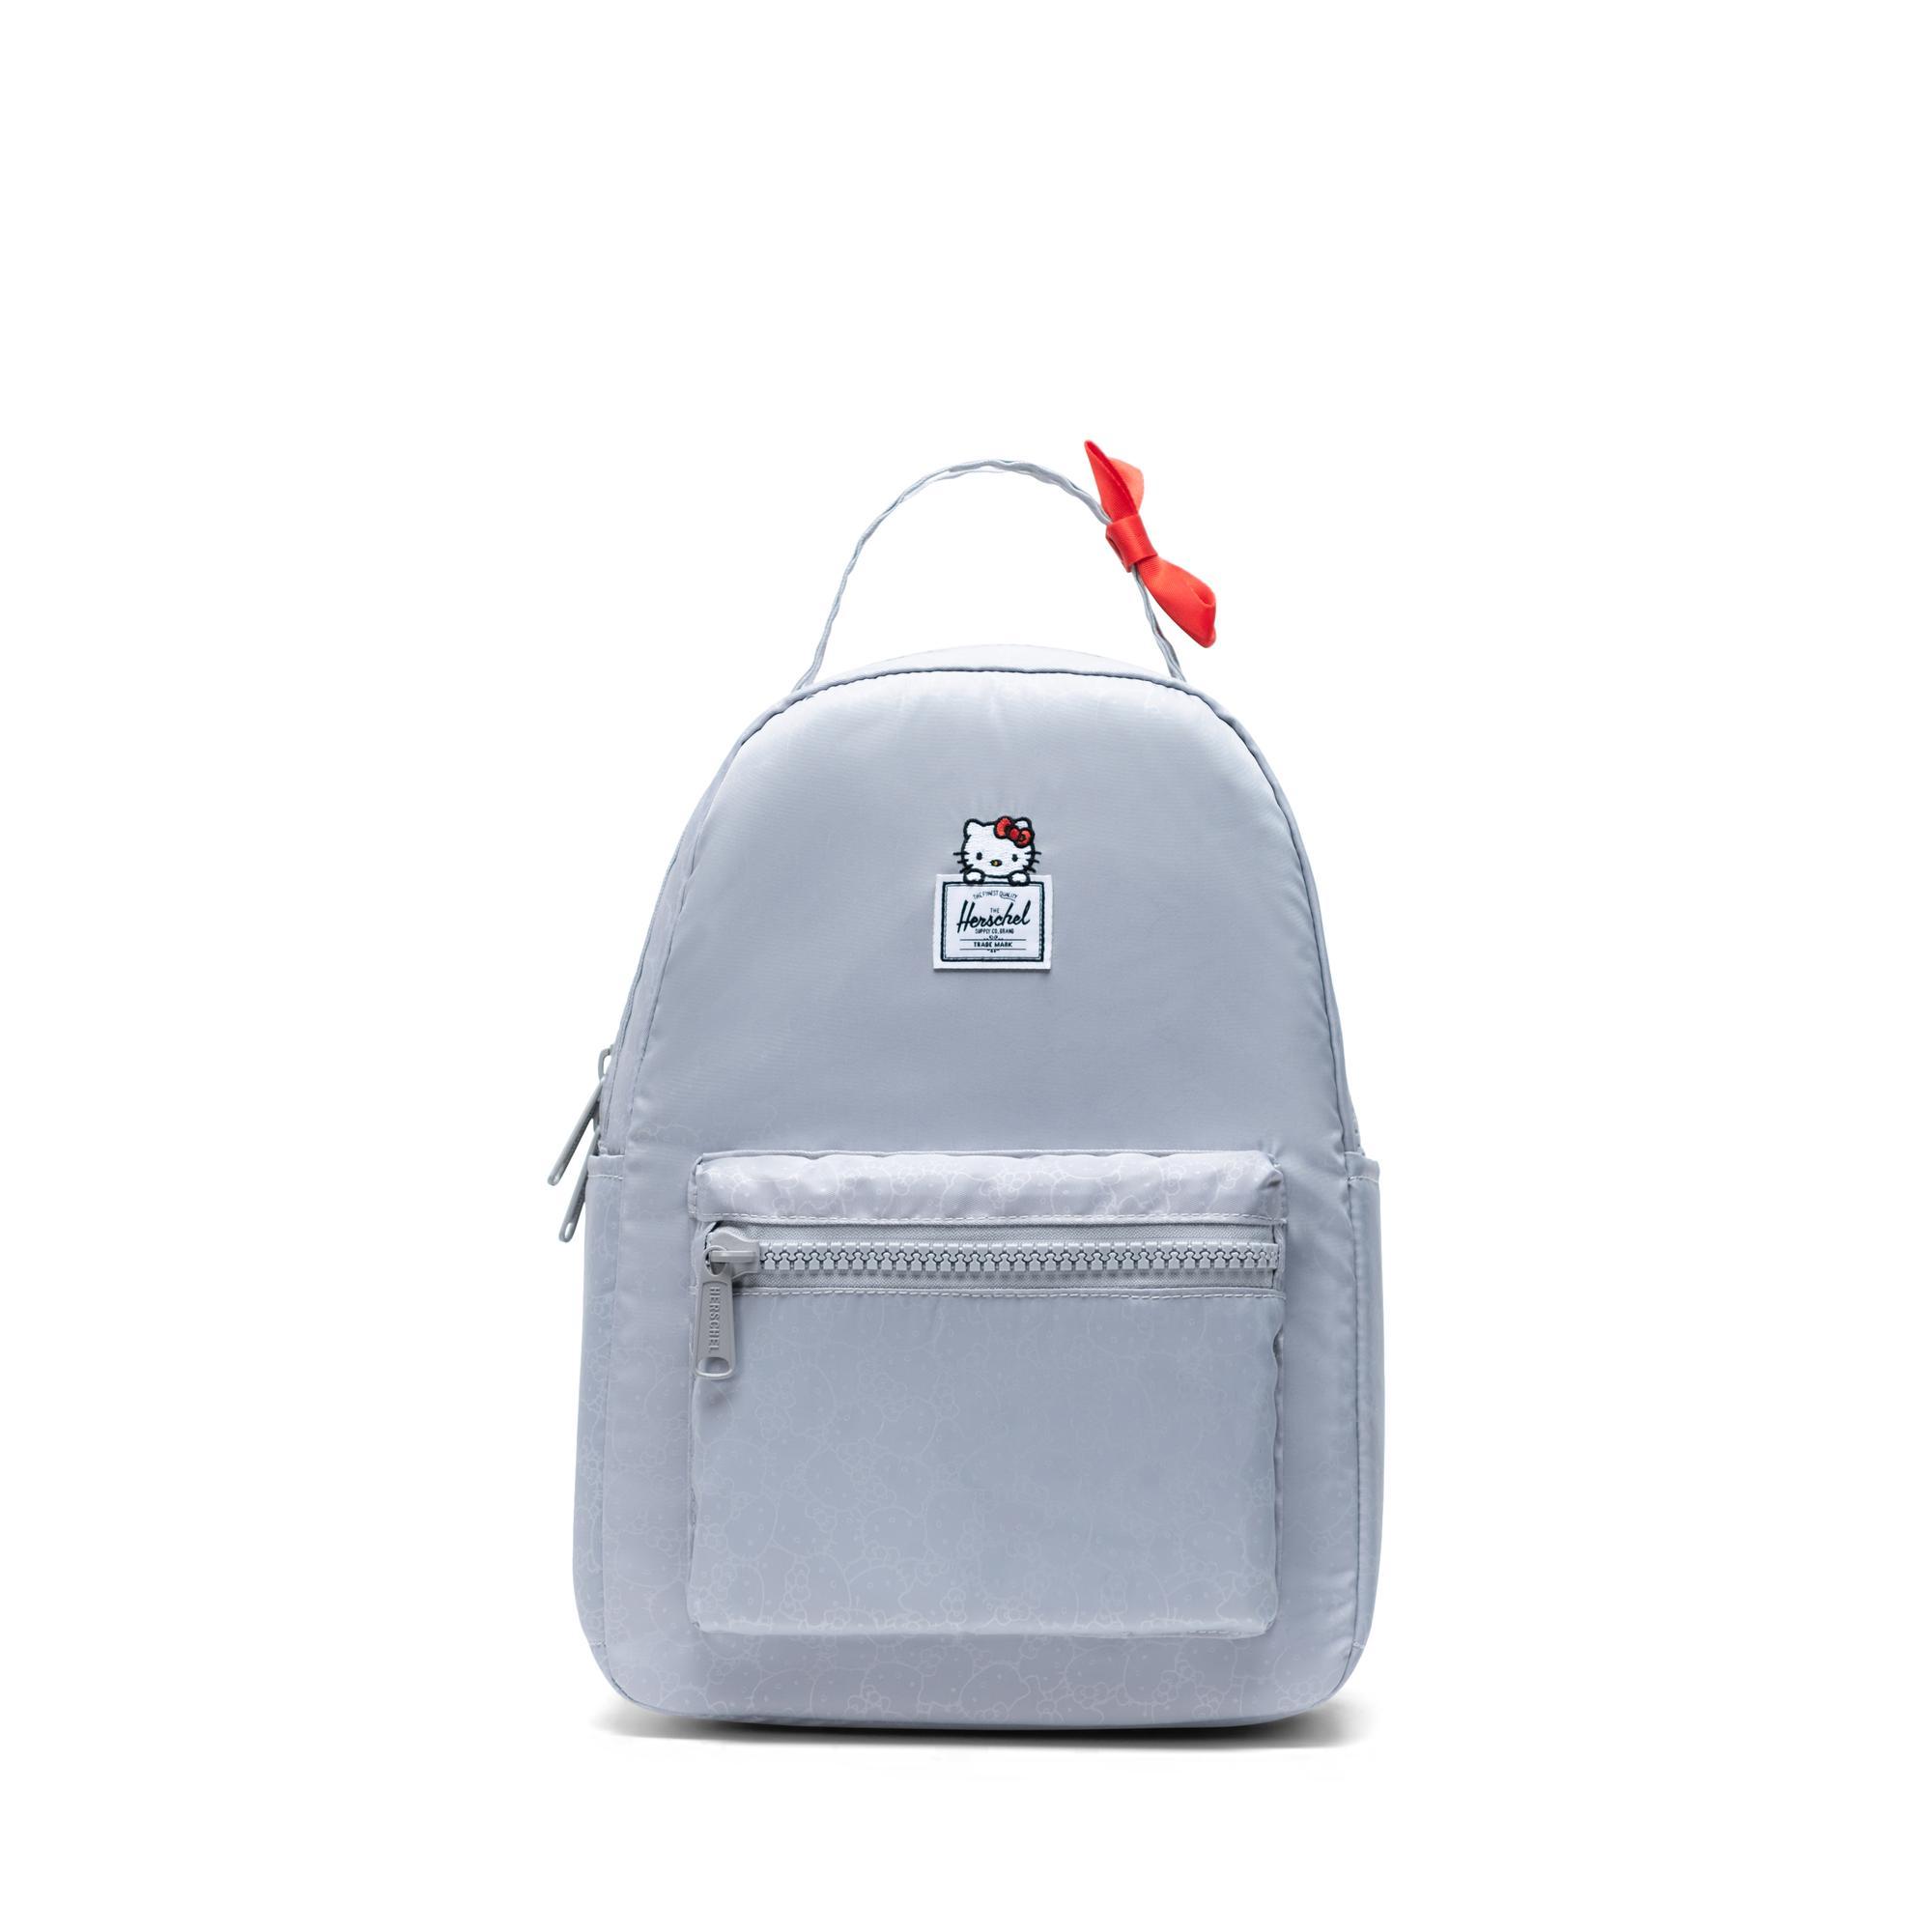 7c7d7b504477 Nova Backpack Small Hello Kitty